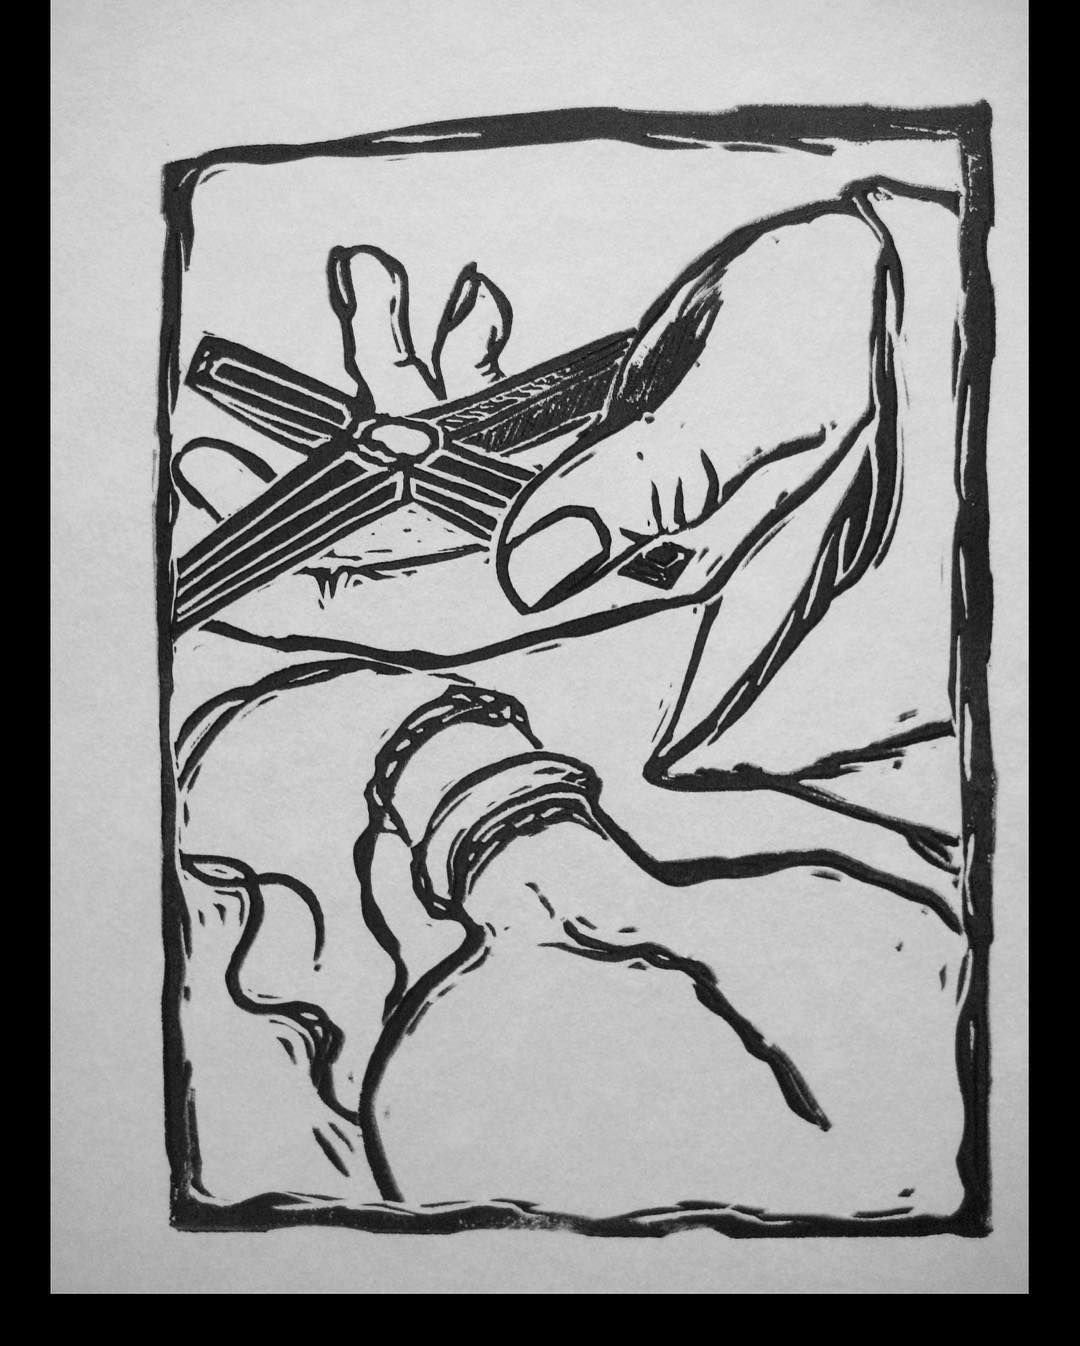 #lorraineimwoldart http://ift.tt/29cAcN8 #romeoandjuliet #shakespeare #youngloveissodramatic